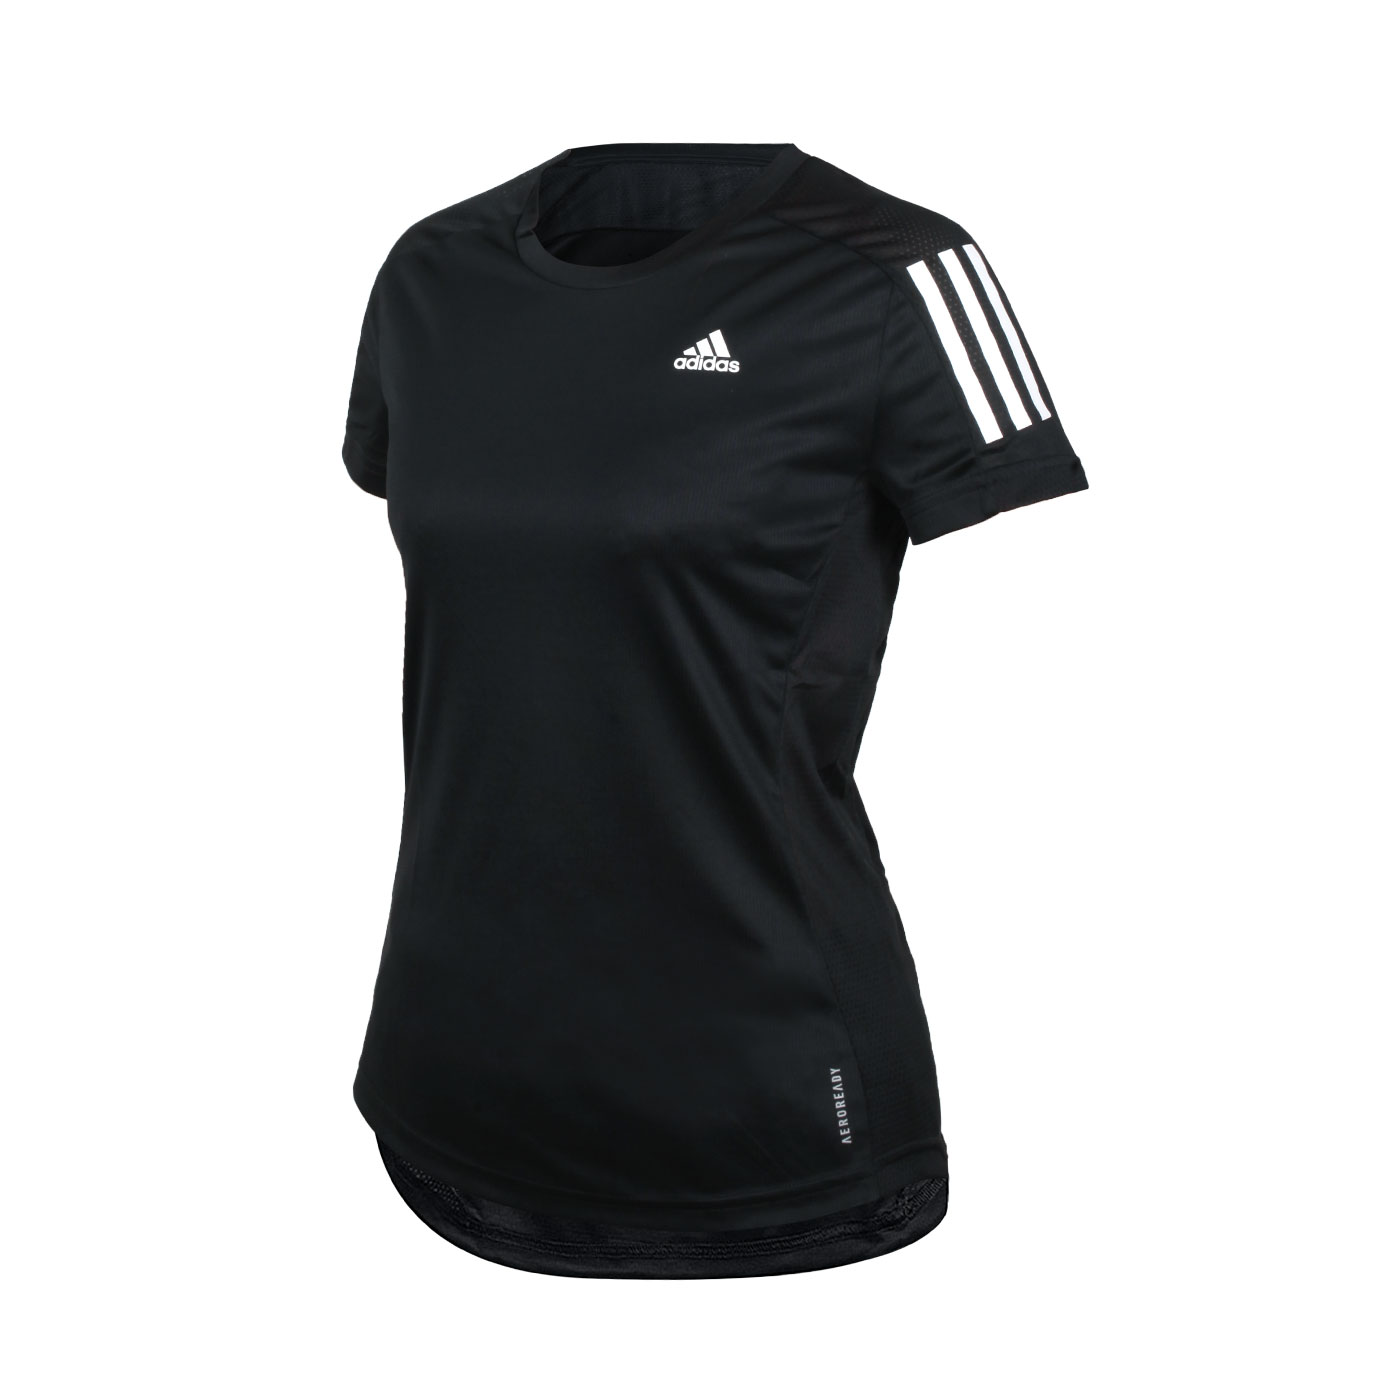 ADIDAS 女款短袖T恤 FS9830 - 黑白